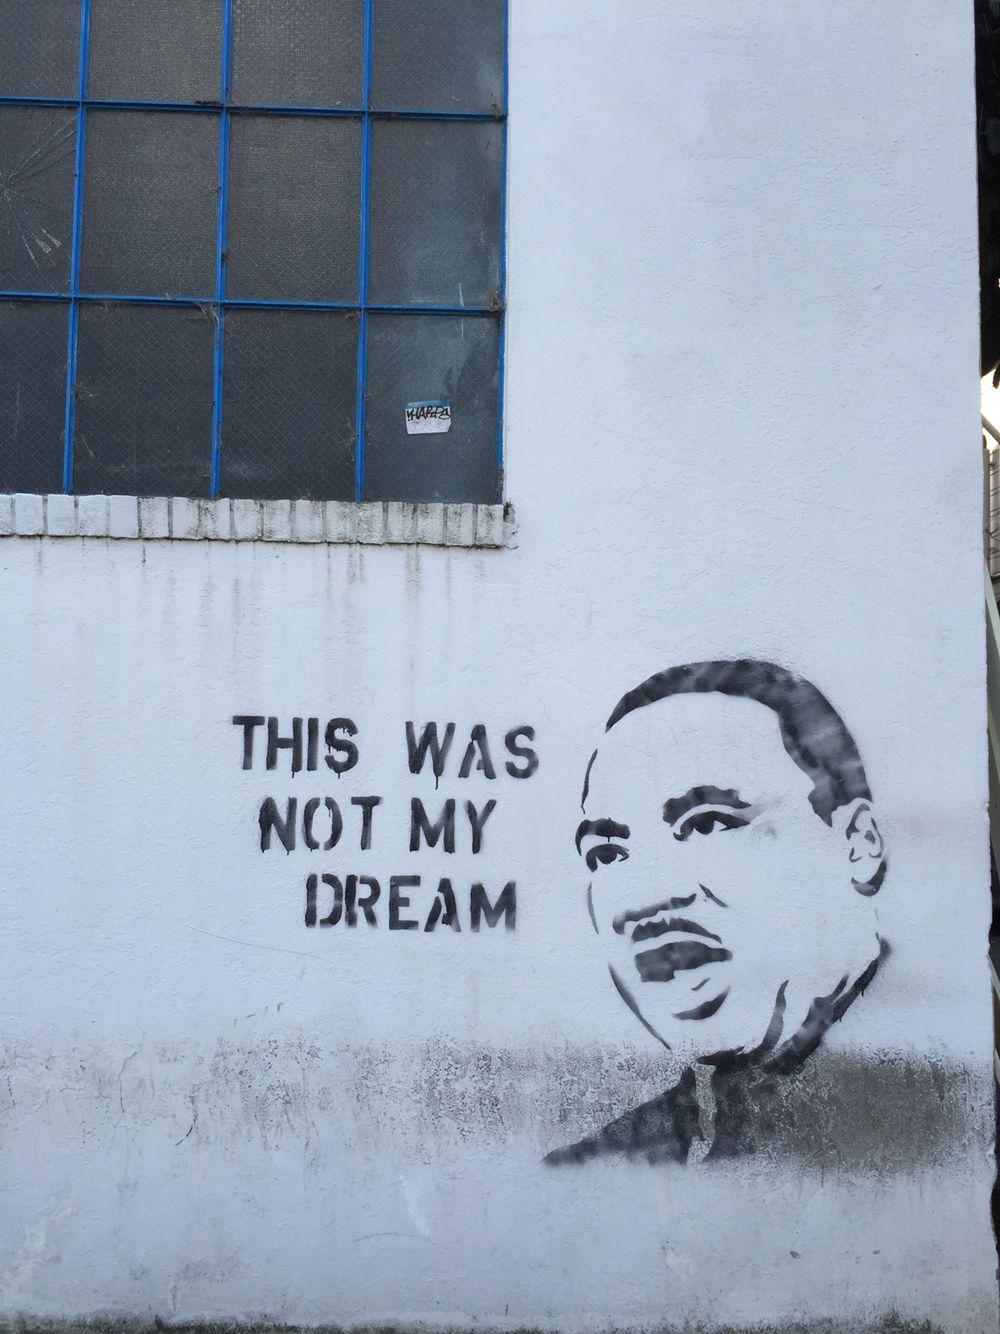 Pin by 𝒶𝒷𝒾𝑔𝒶𝒾𝓁 on wisdom pinterest art street art and banksy